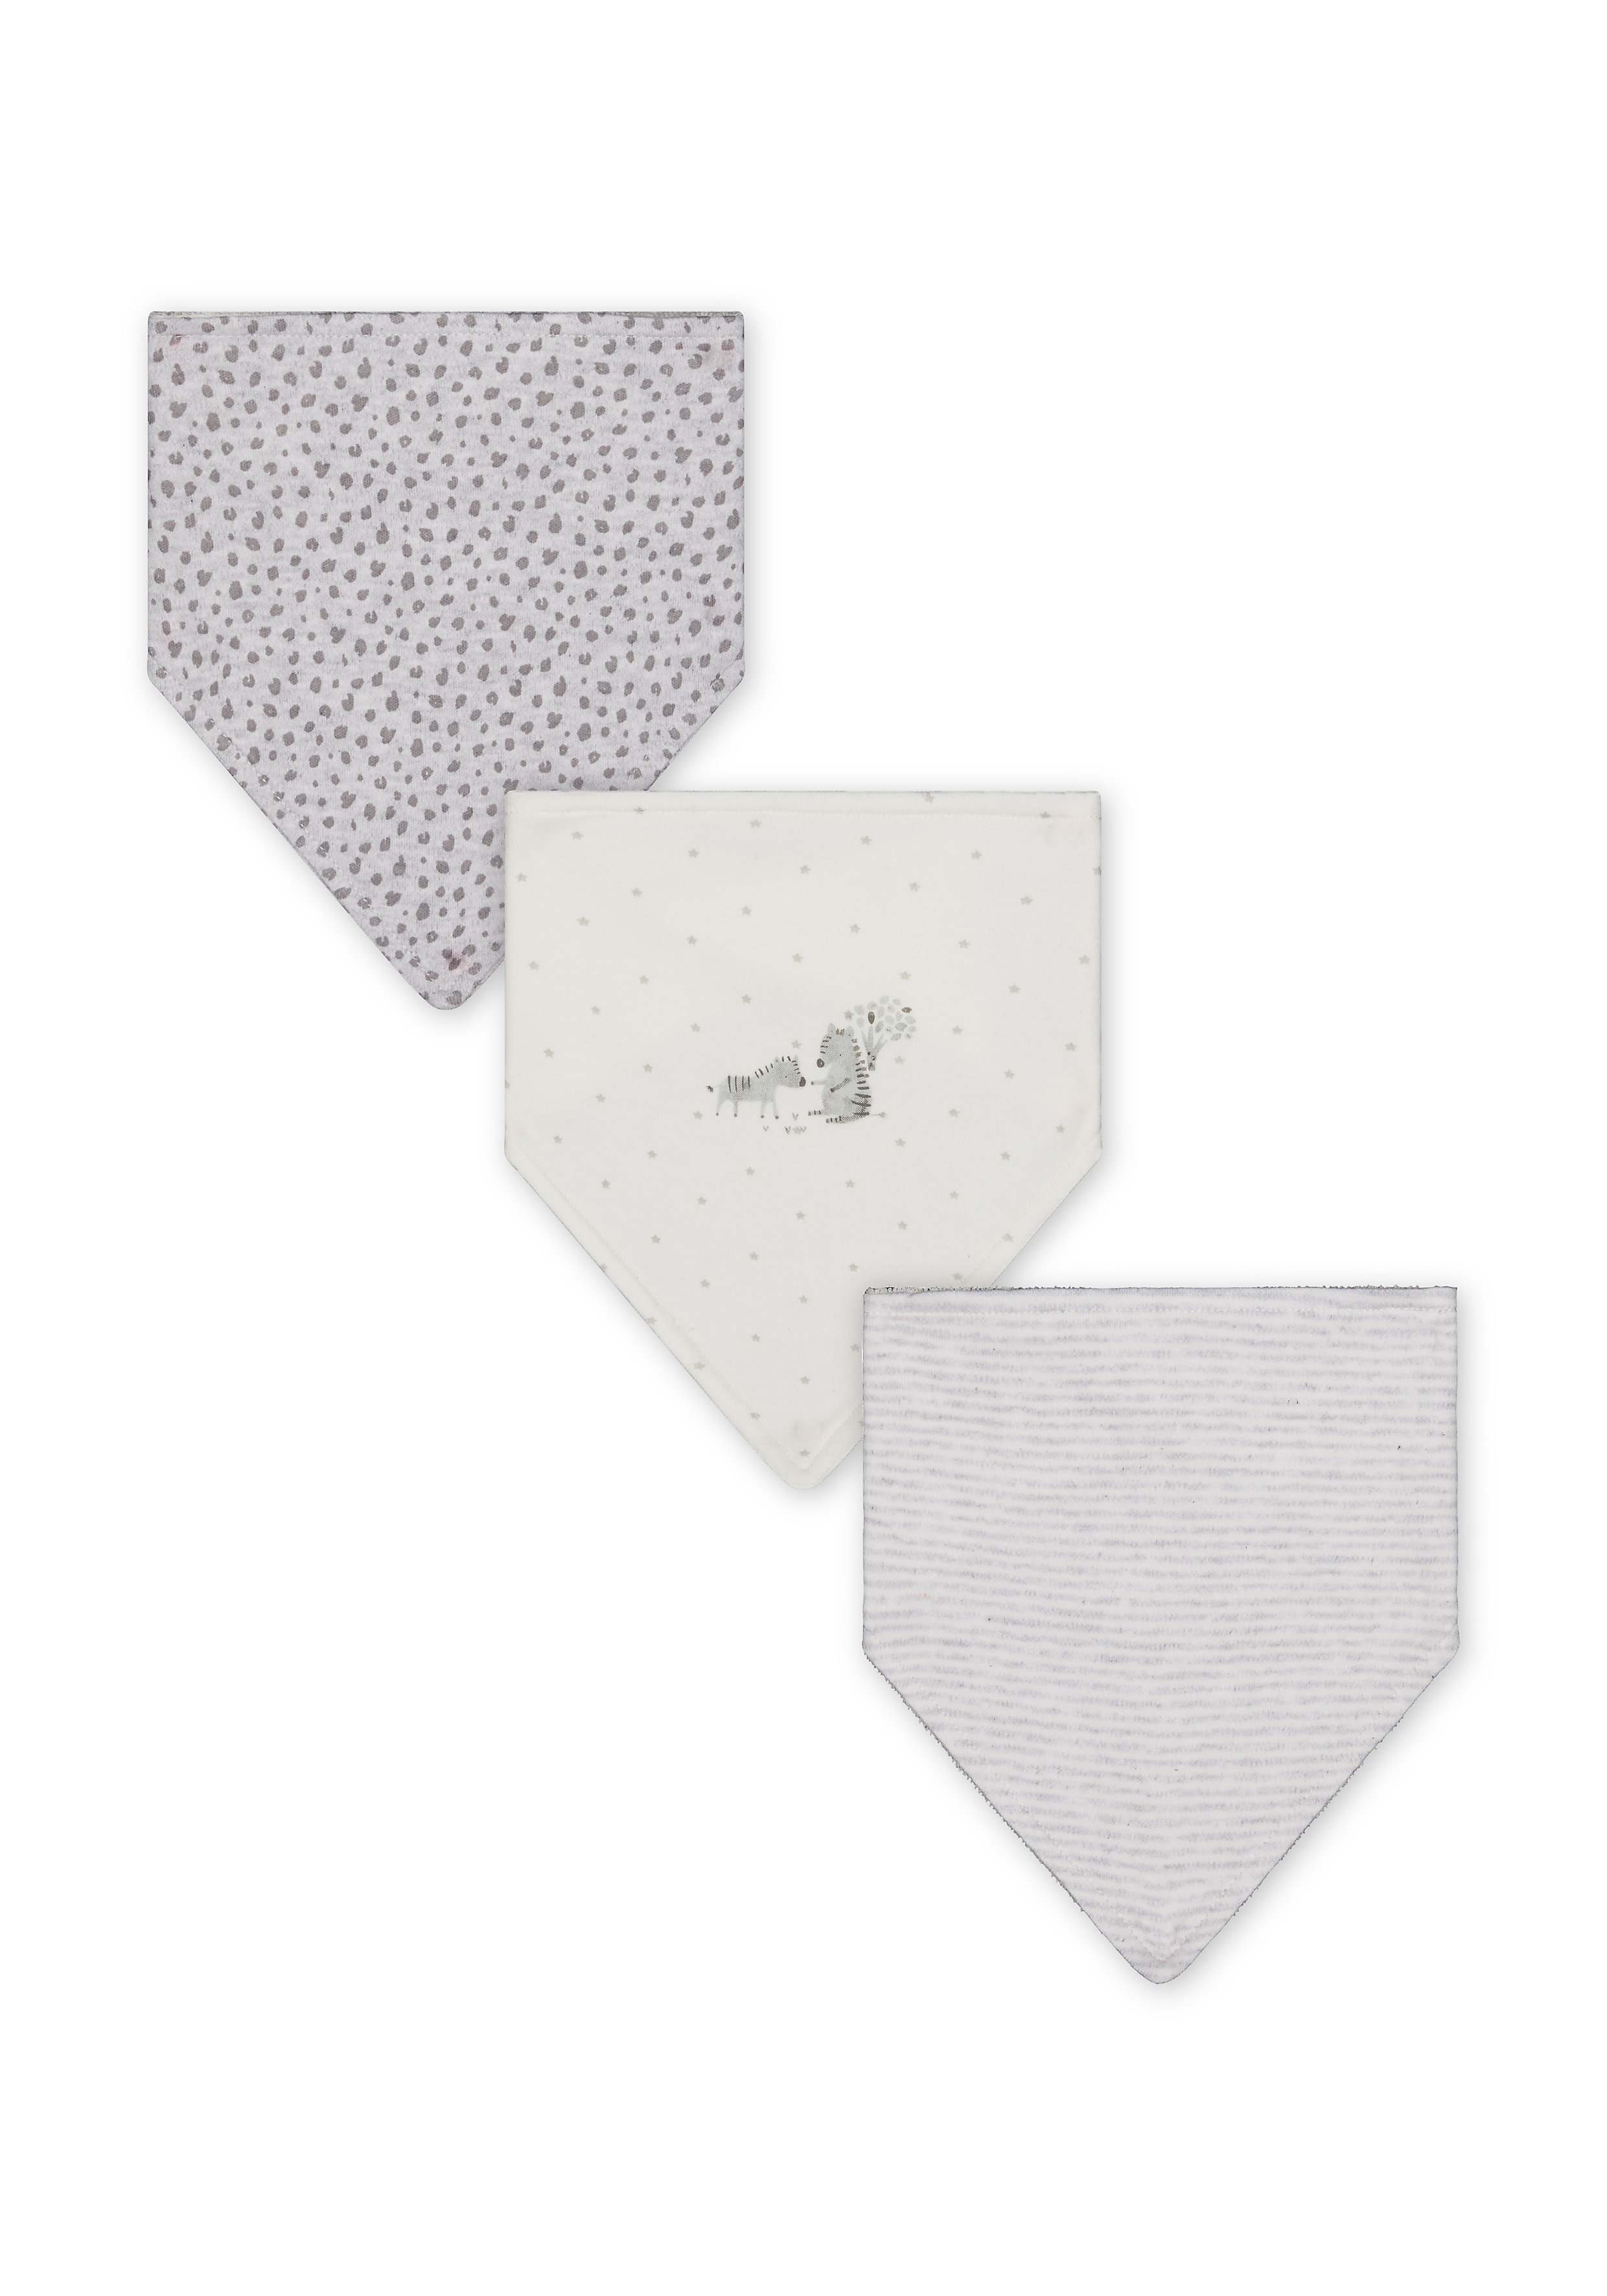 Mothercare | Unisex Bibs Leopard Print - Pack Of 3 - Grey